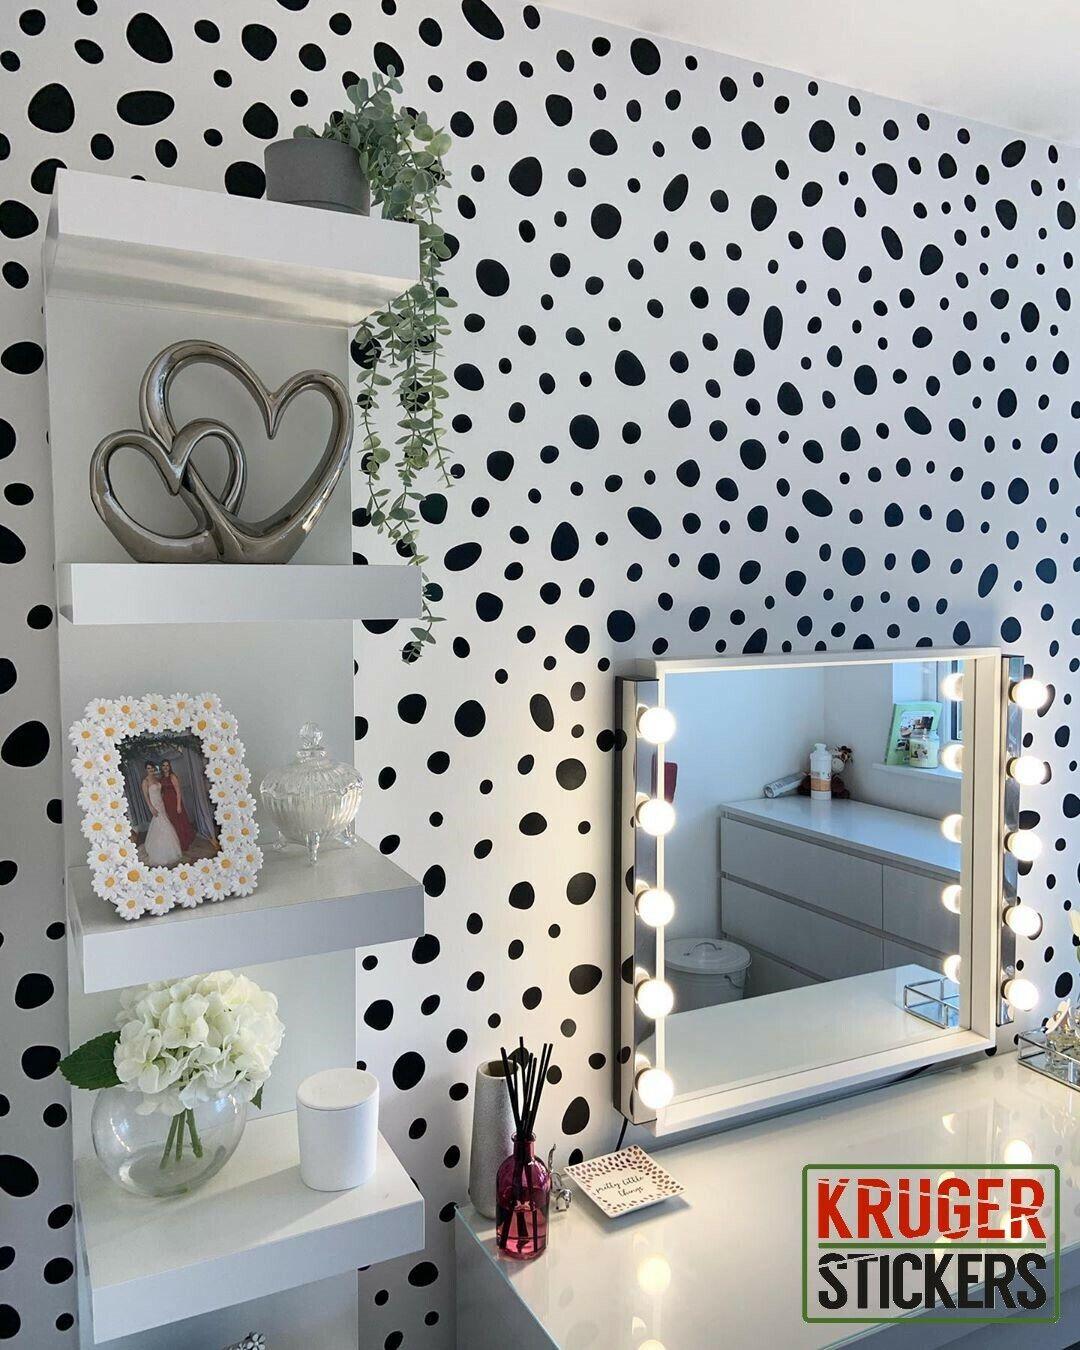 Home Decoration - Dalmation Spots Dot Wall Stickers Decal Child Vinyl Art Decor Nursery Home 91